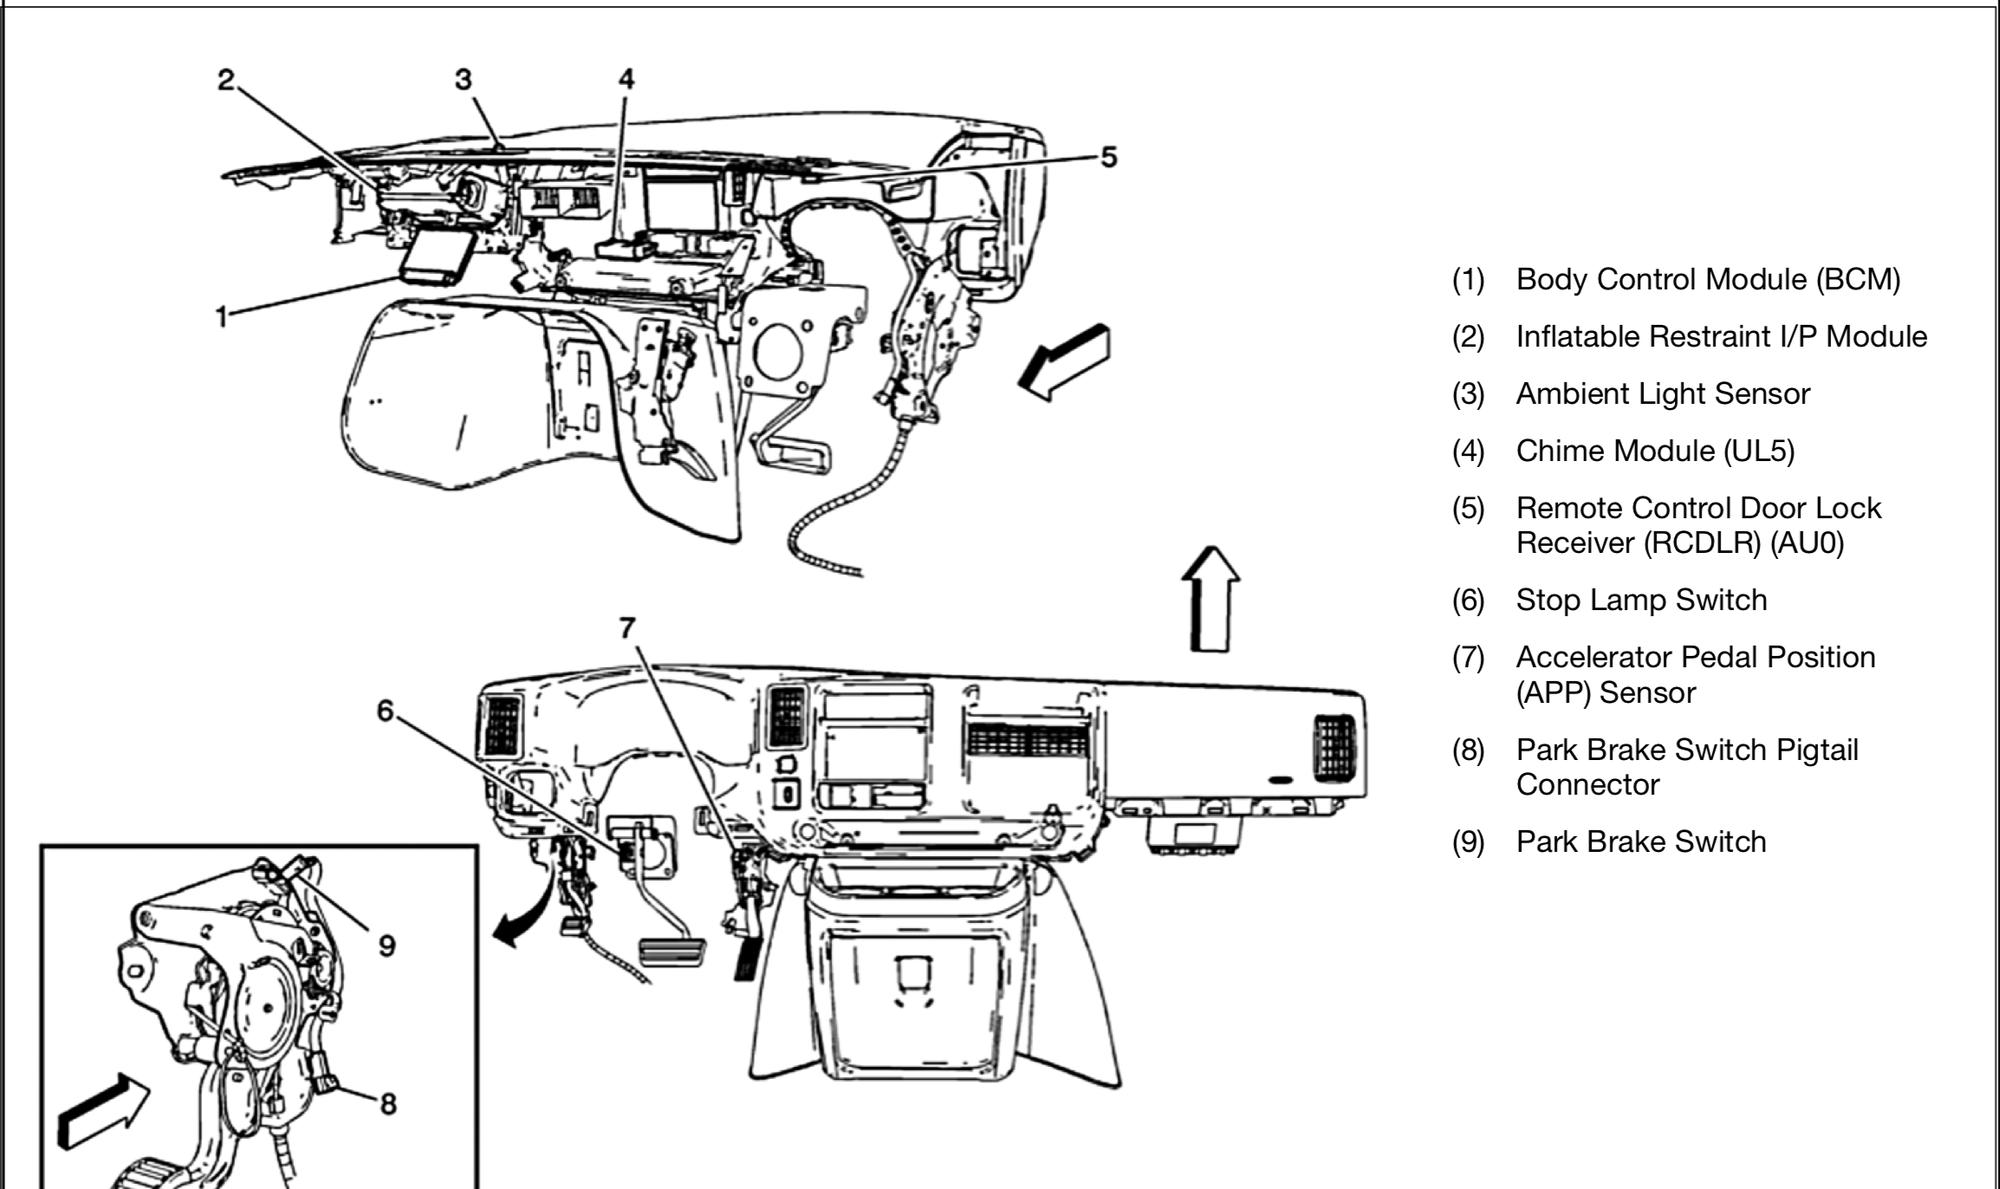 2014 Body Control Module Location